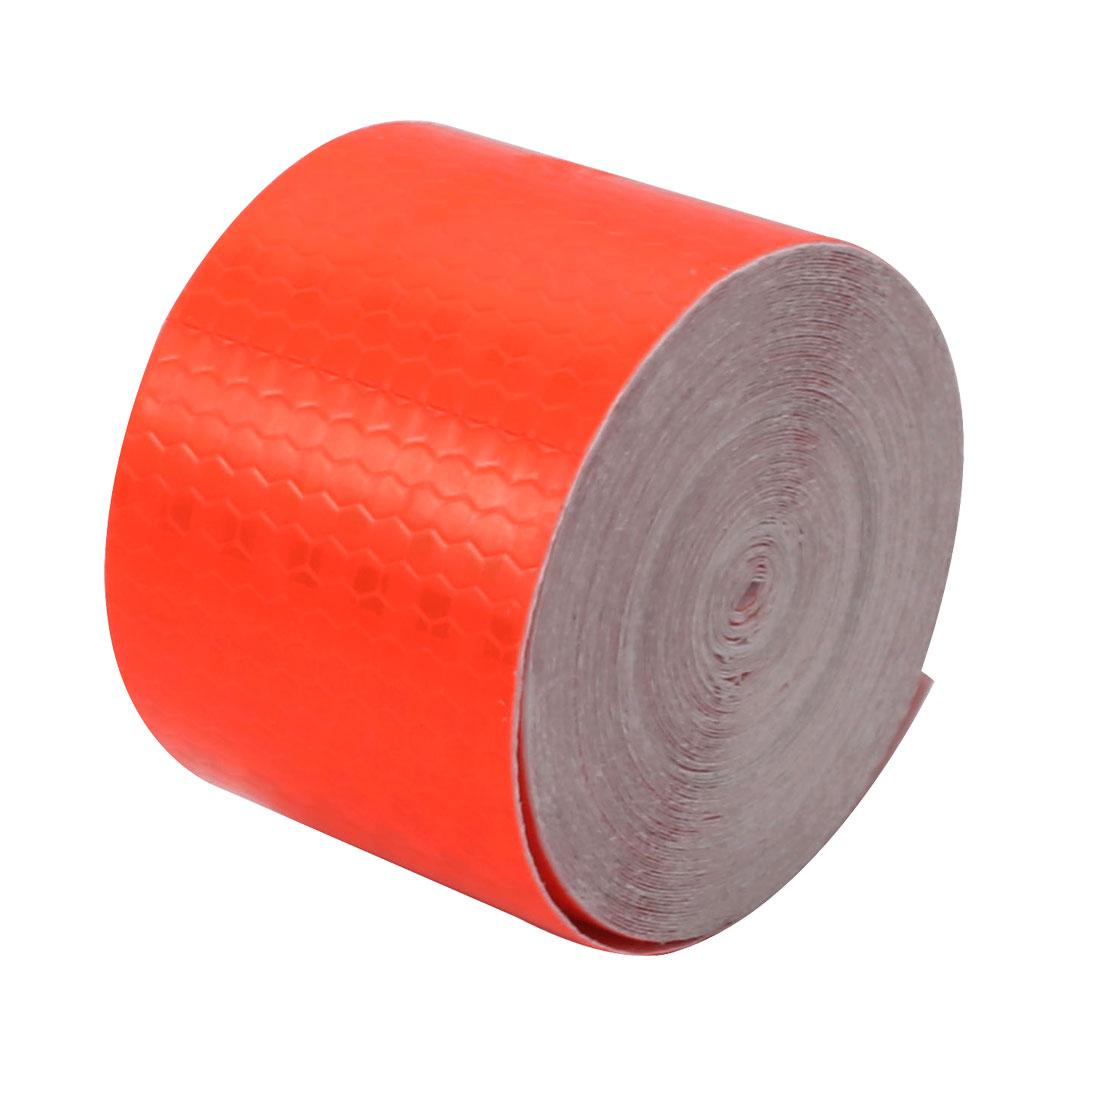 5cm Wide 10M Length Single Sided Adhesive Reflective Warning Tape Golden Orange